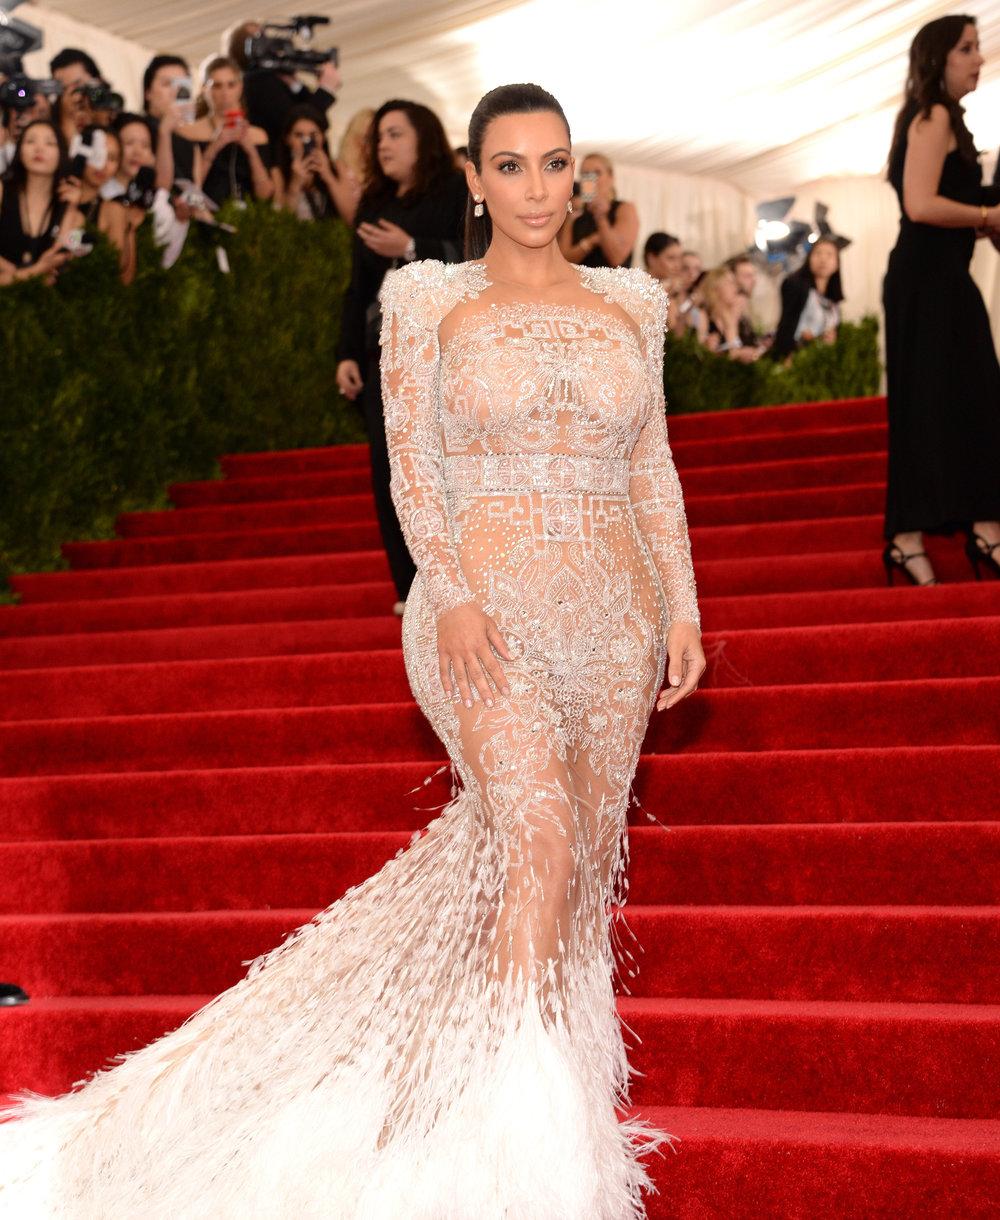 kim-kardashian-west-met-gala-2015-best-dressed.jpg